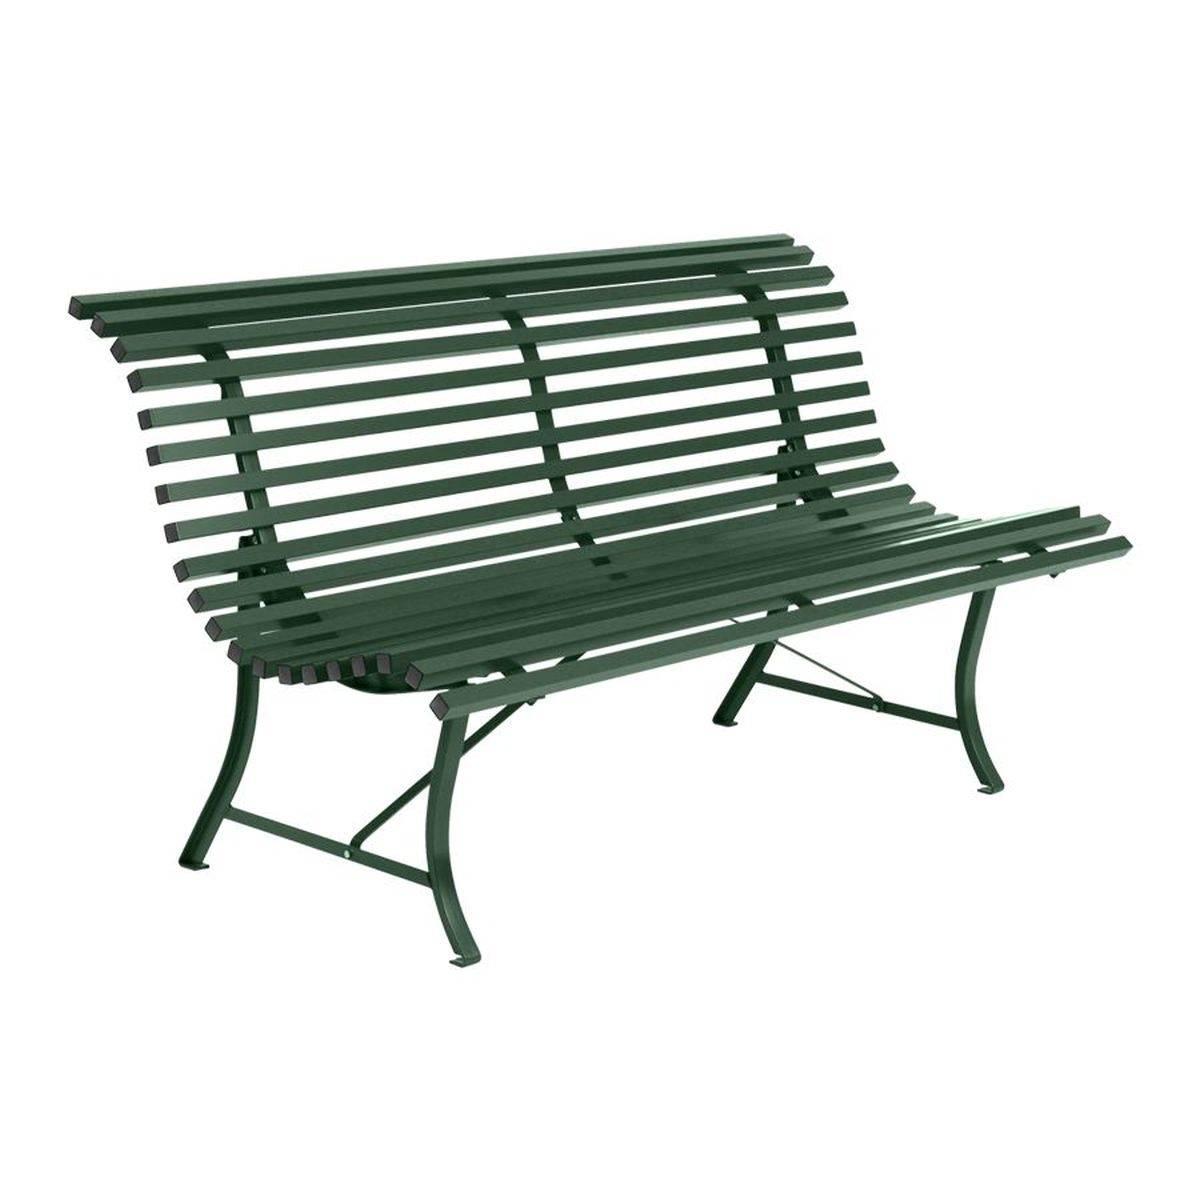 Surprising Fermob Louisiane Bench 150Cm Outdoor Furniture Jardin Nz Theyellowbook Wood Chair Design Ideas Theyellowbookinfo